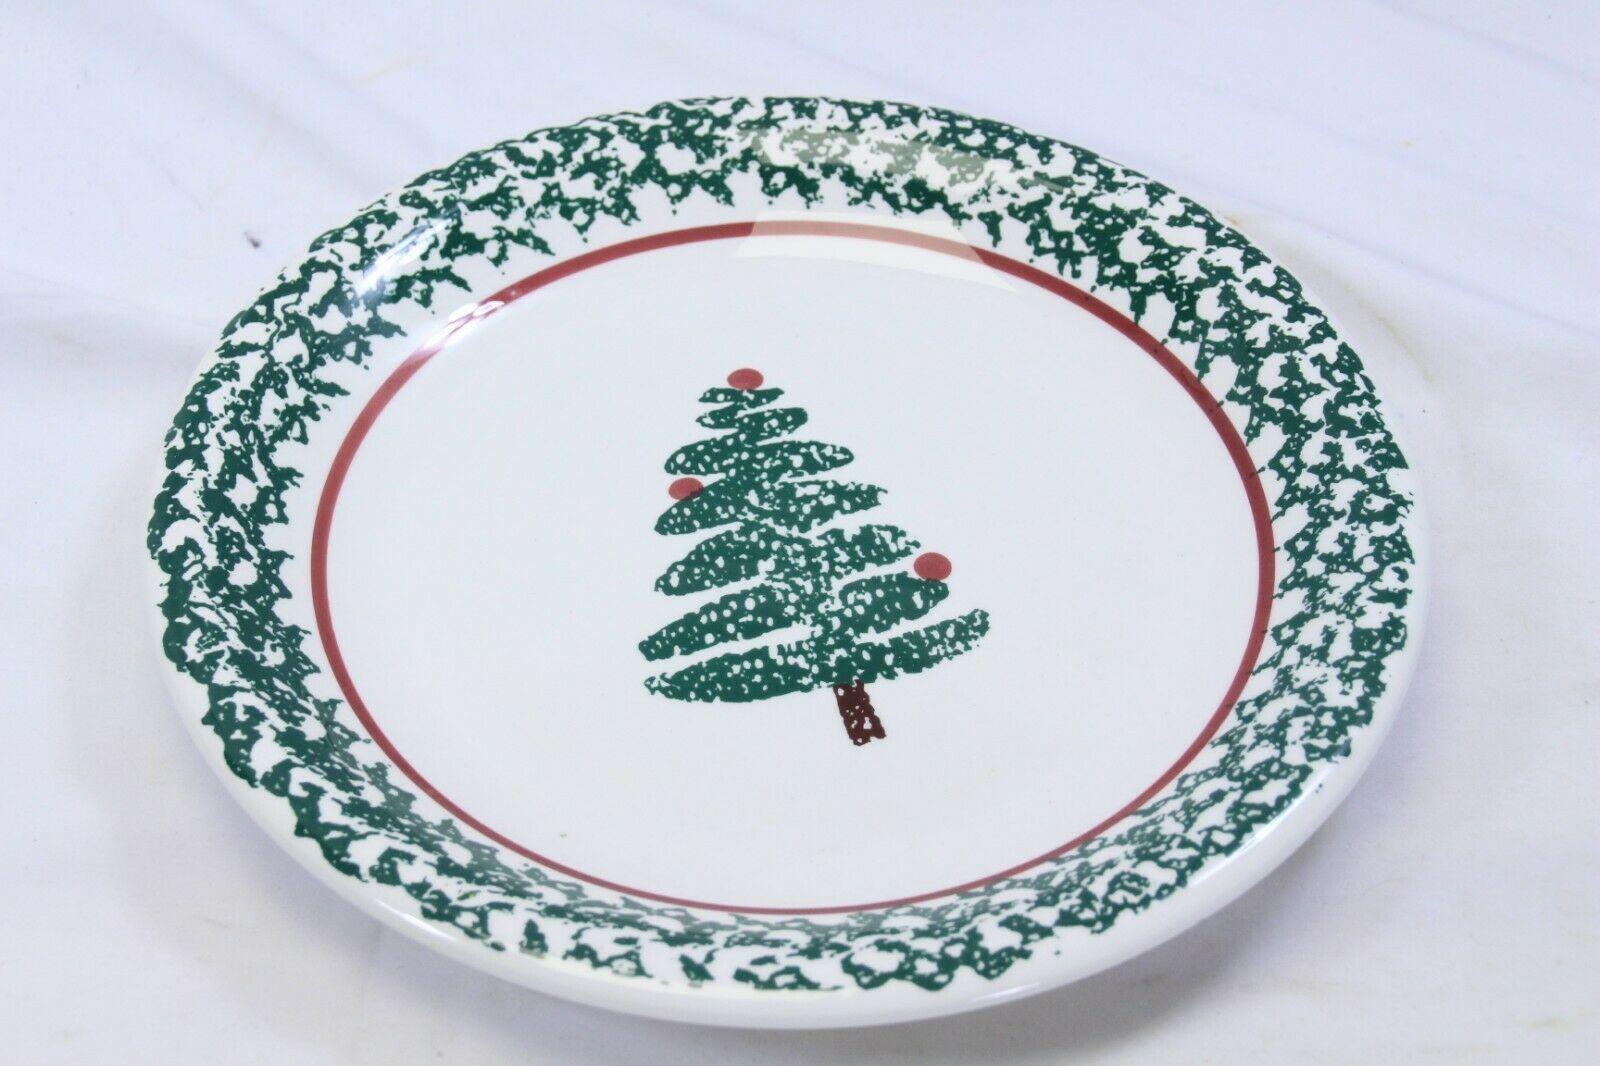 "Furio Xmas Tree Dinner Plates Sponge 10.25"" Set of 8 Made in Italy"